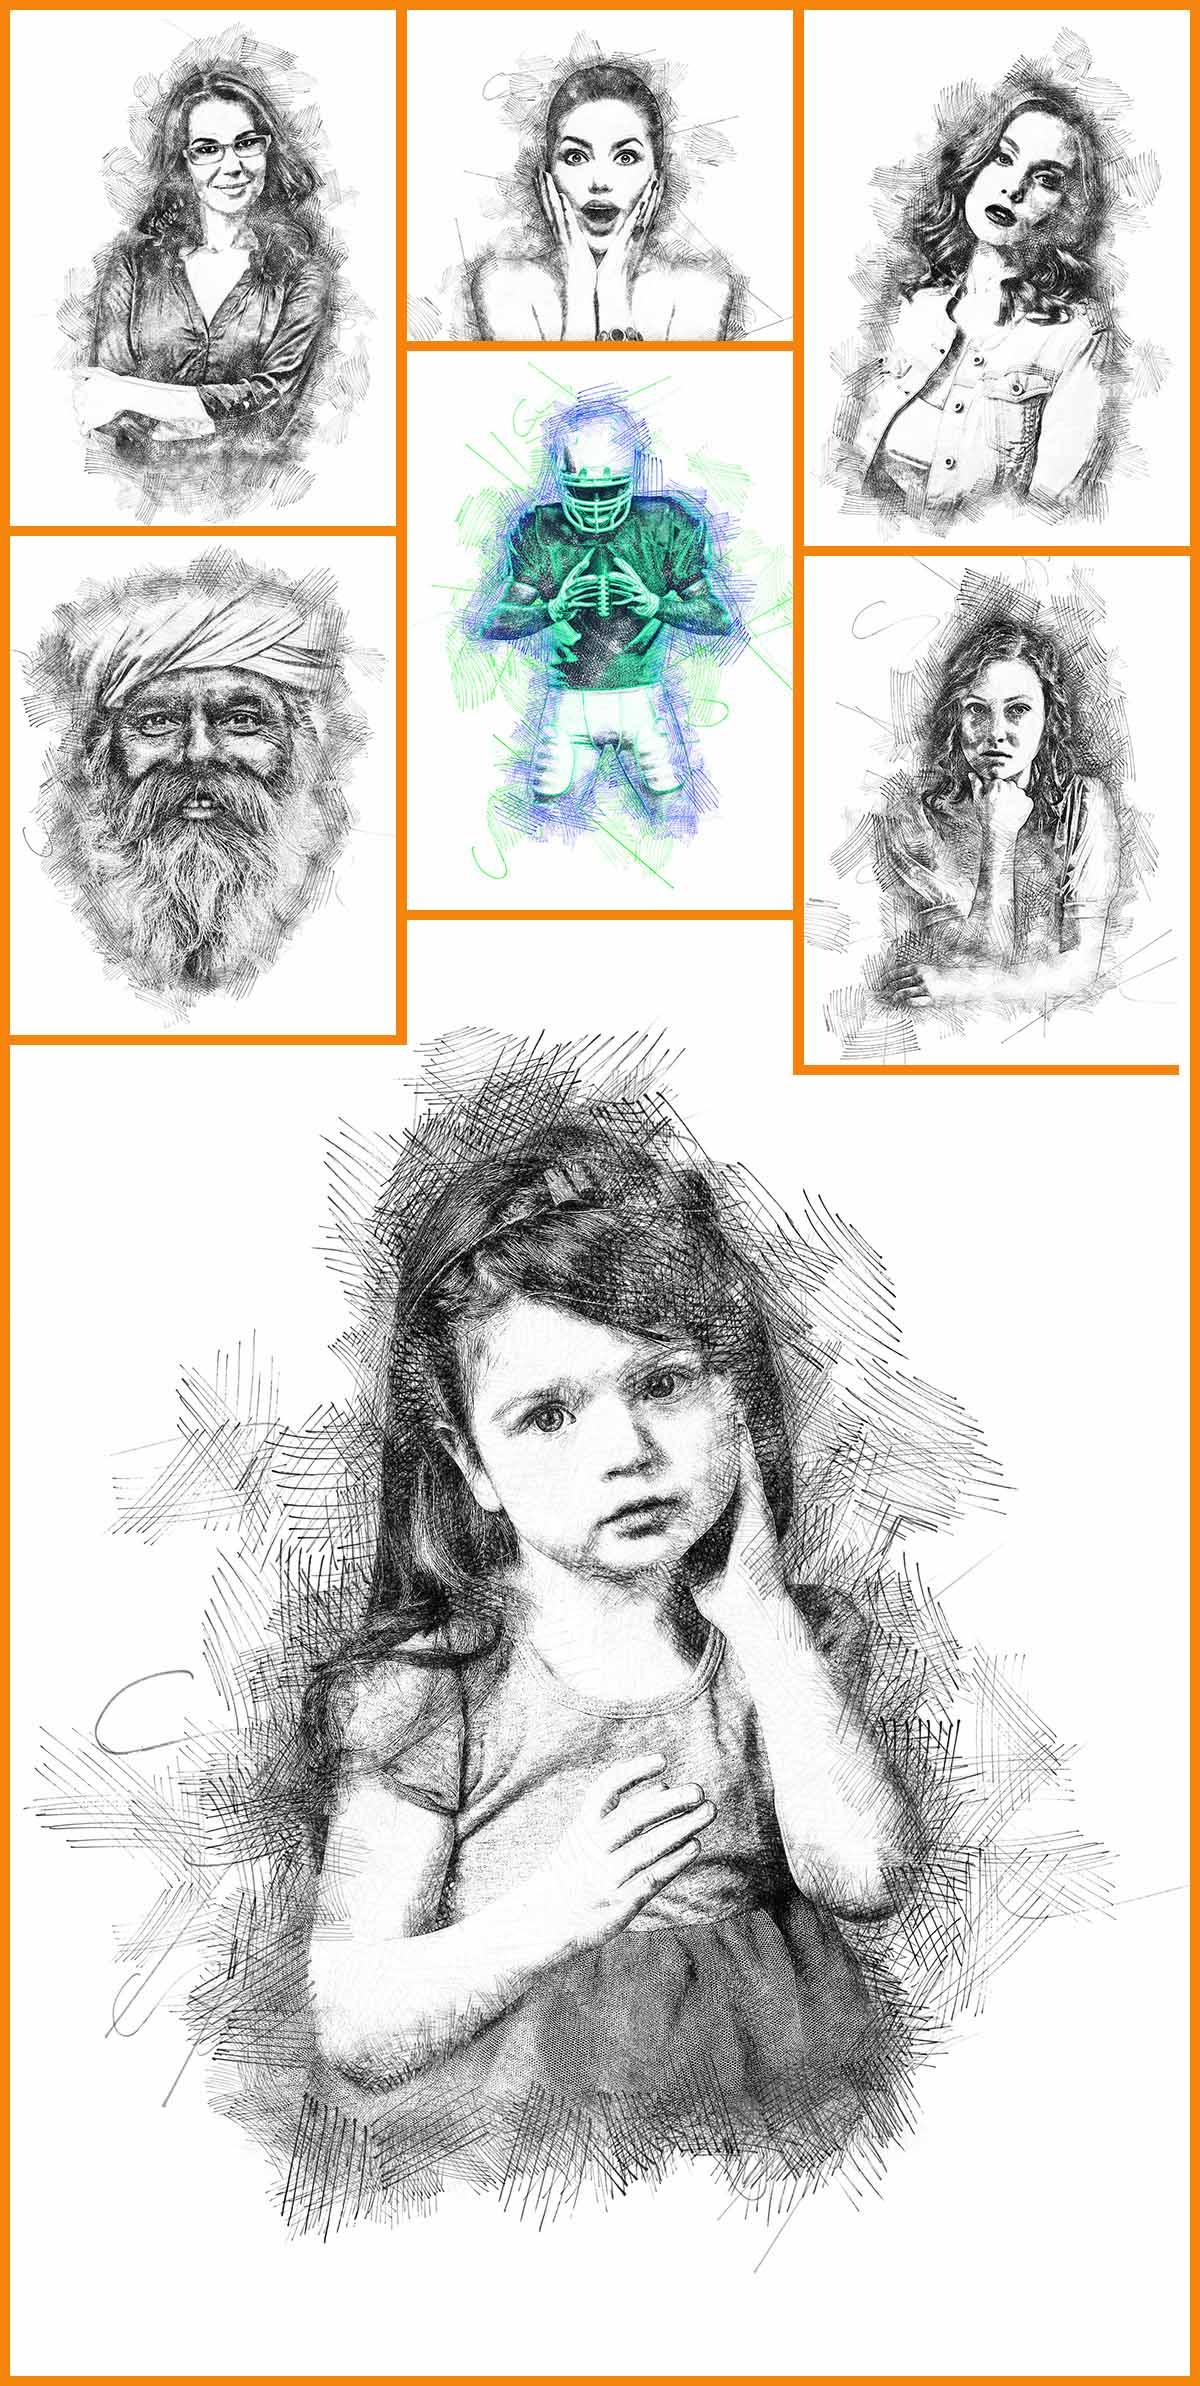 customization-tips Felt-Pen Sketch Photoshop Action